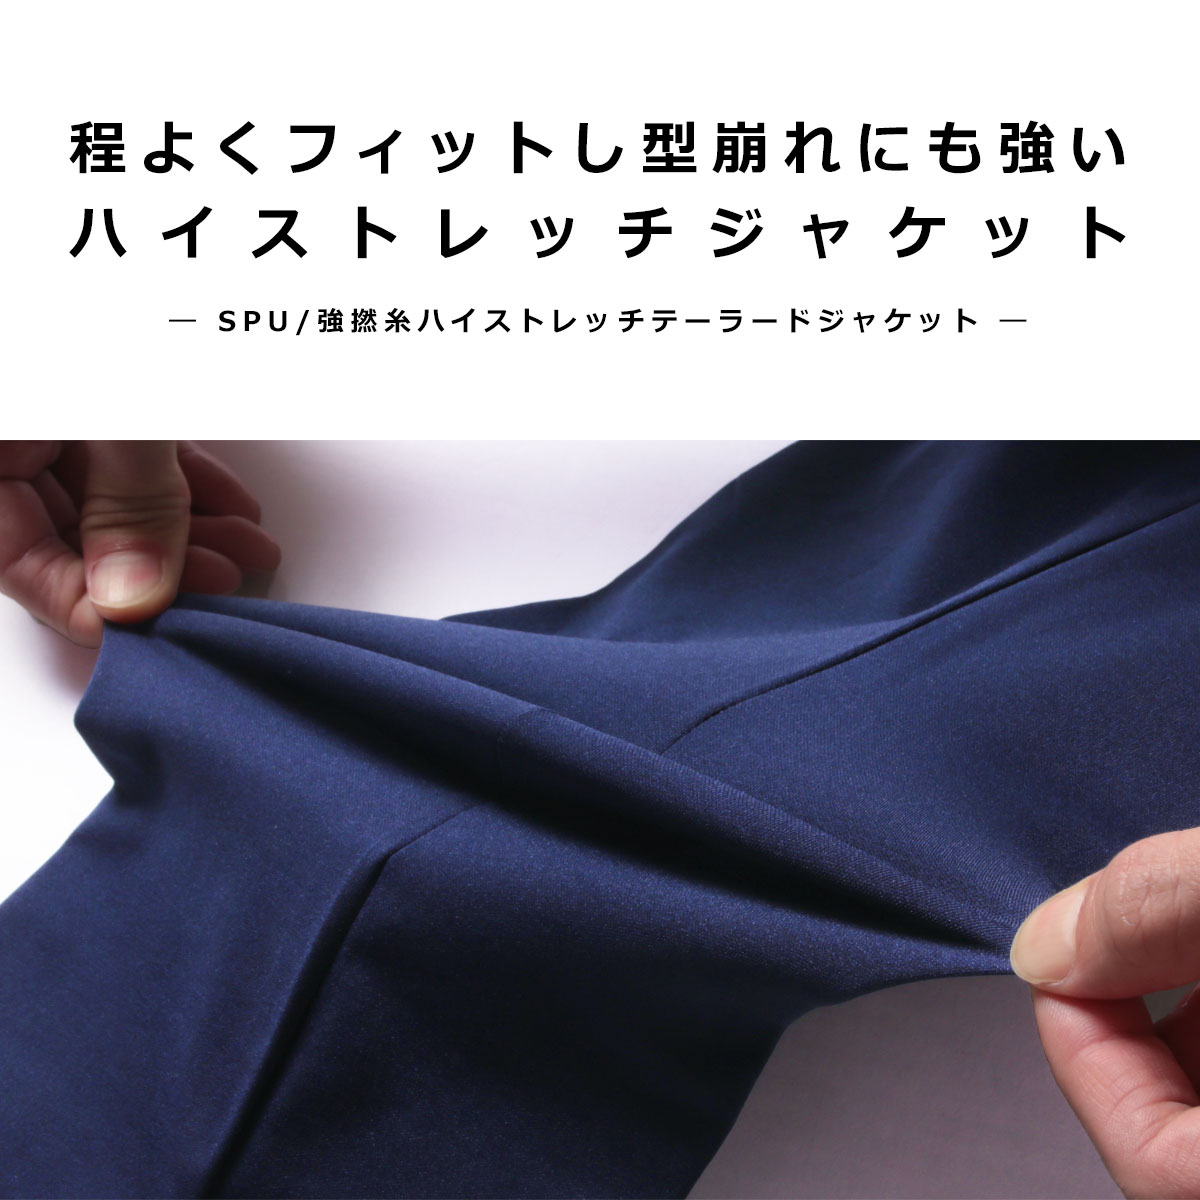 SPU (スプ)メンズ 強撚糸ハイストレッチテーラードジャケット素材